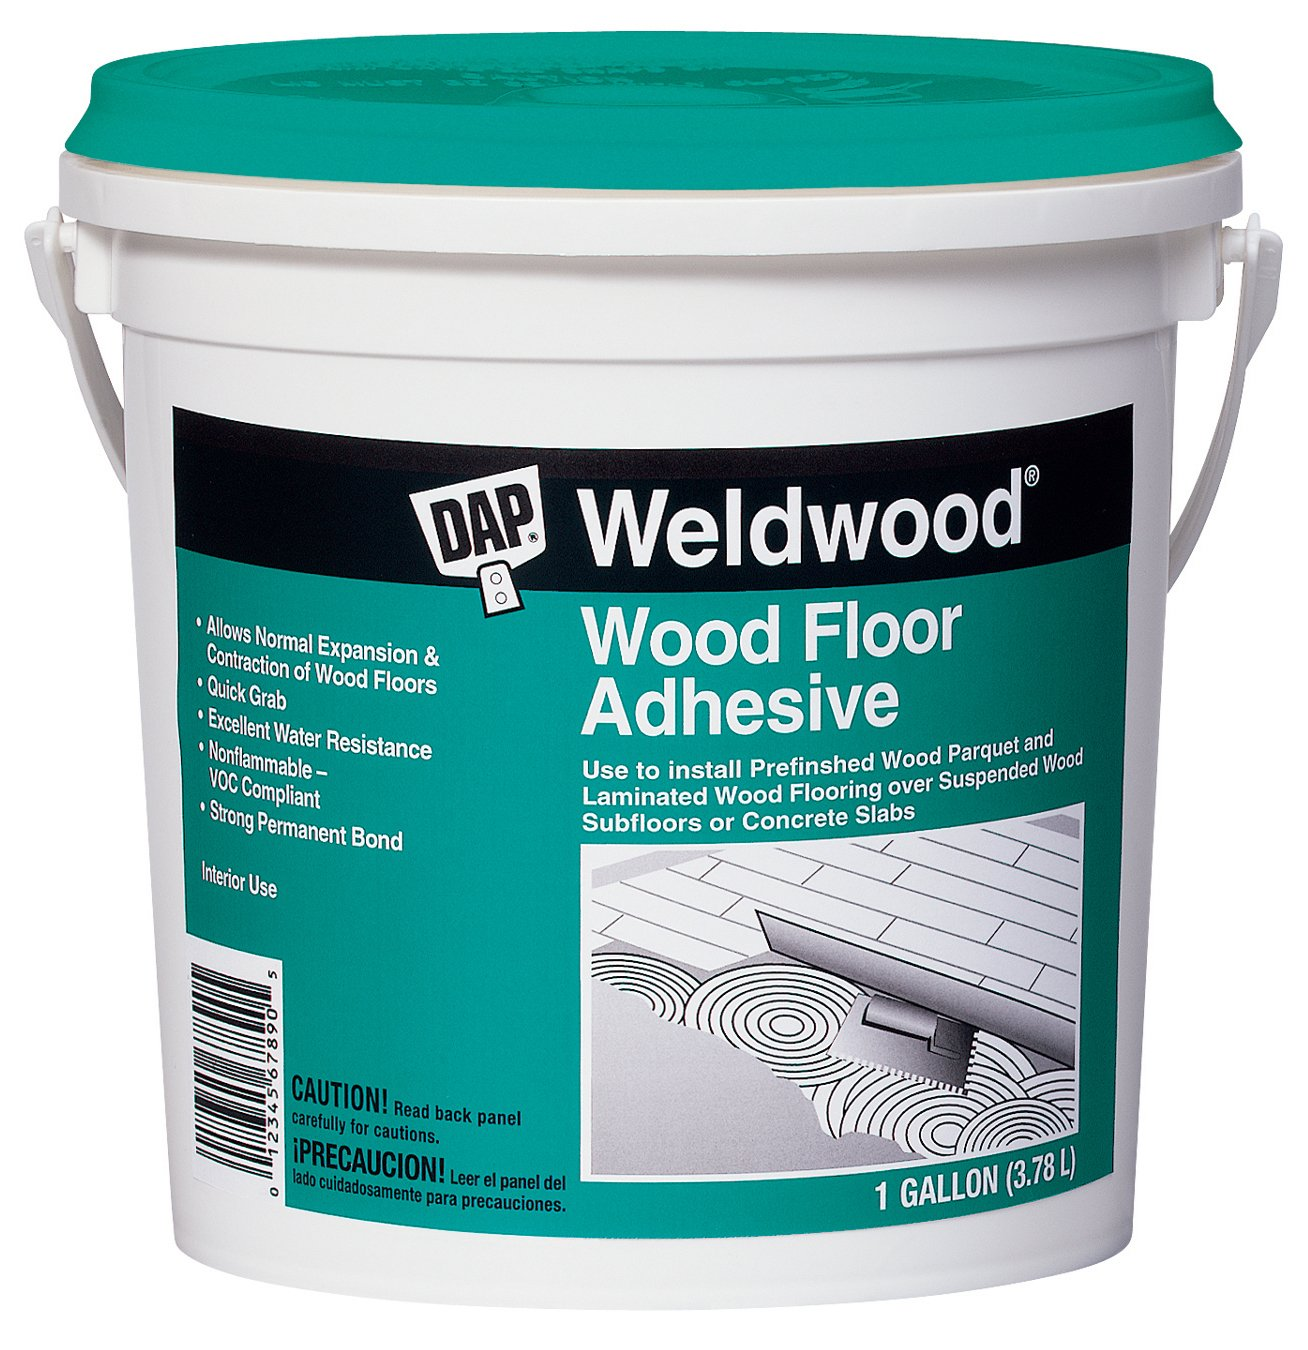 Dap 25133 Weldwood Wood Floor Adhesive, Gallon   Household Wood Stains    Amazon.com